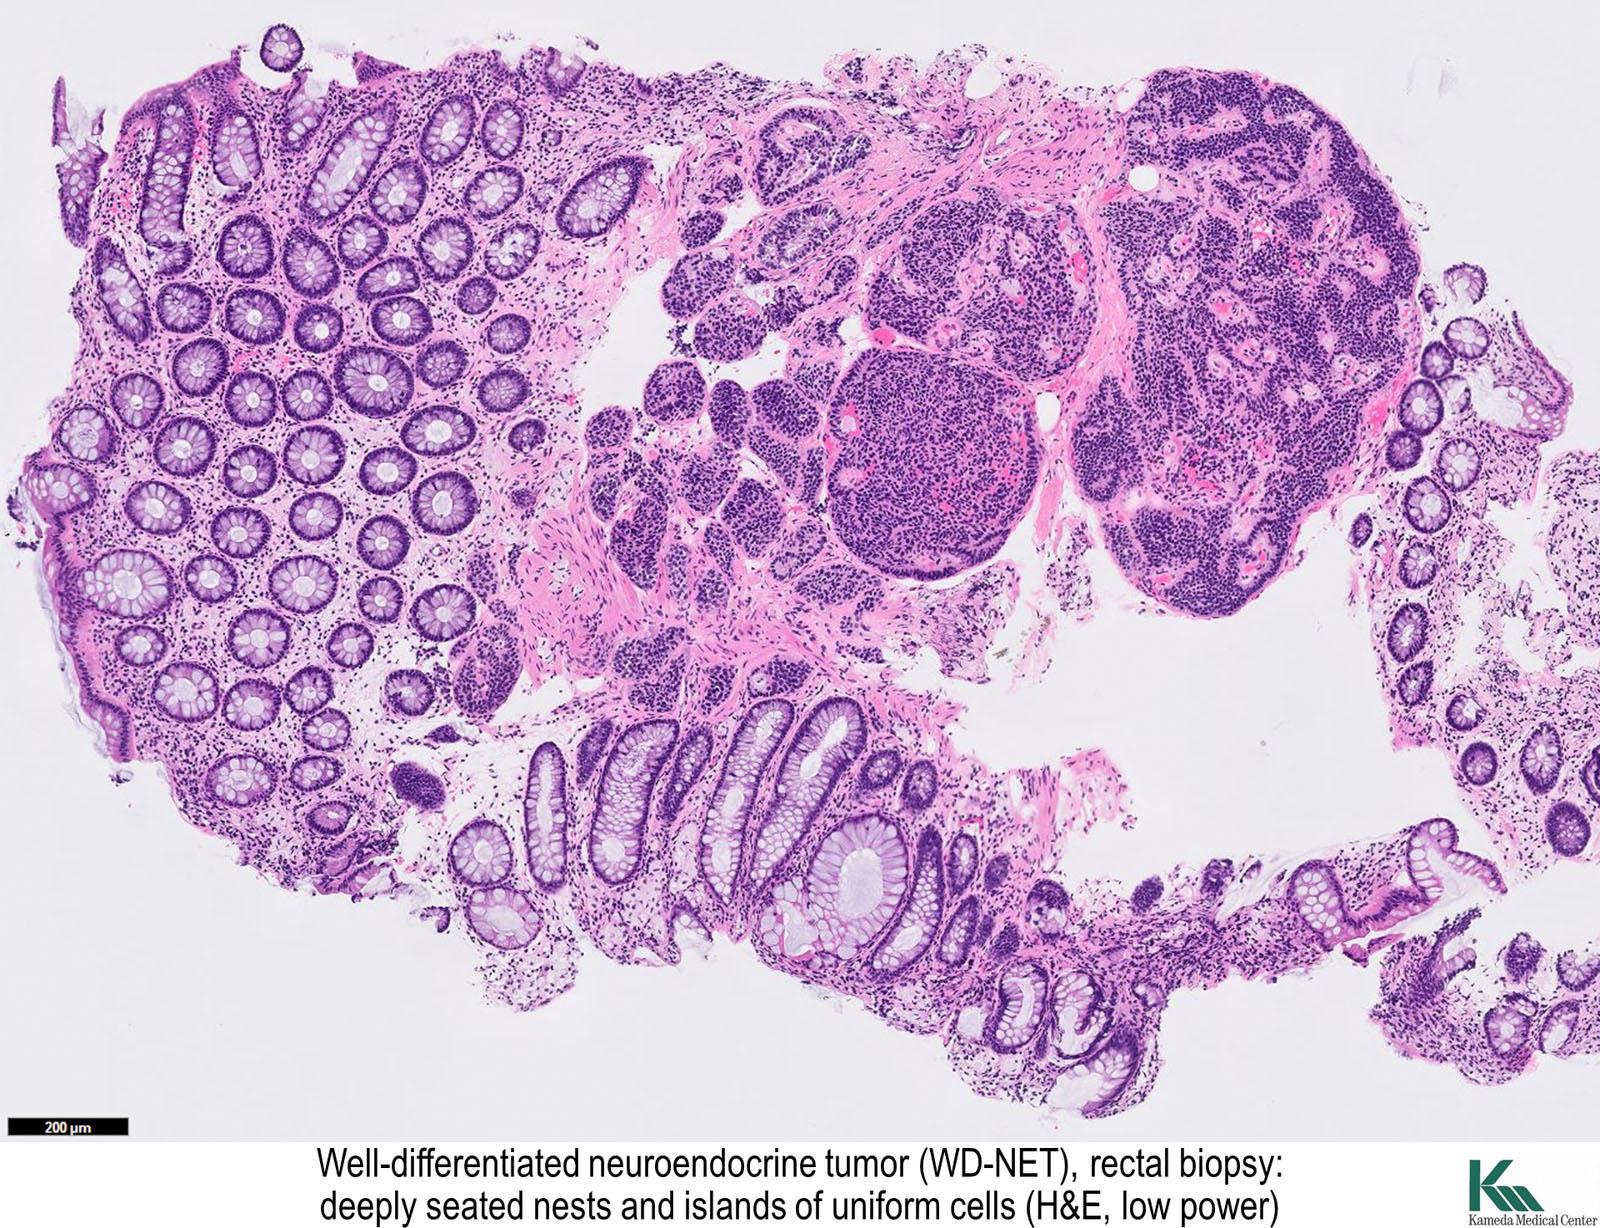 Pathology Outlines Neuroendocrine Tumor